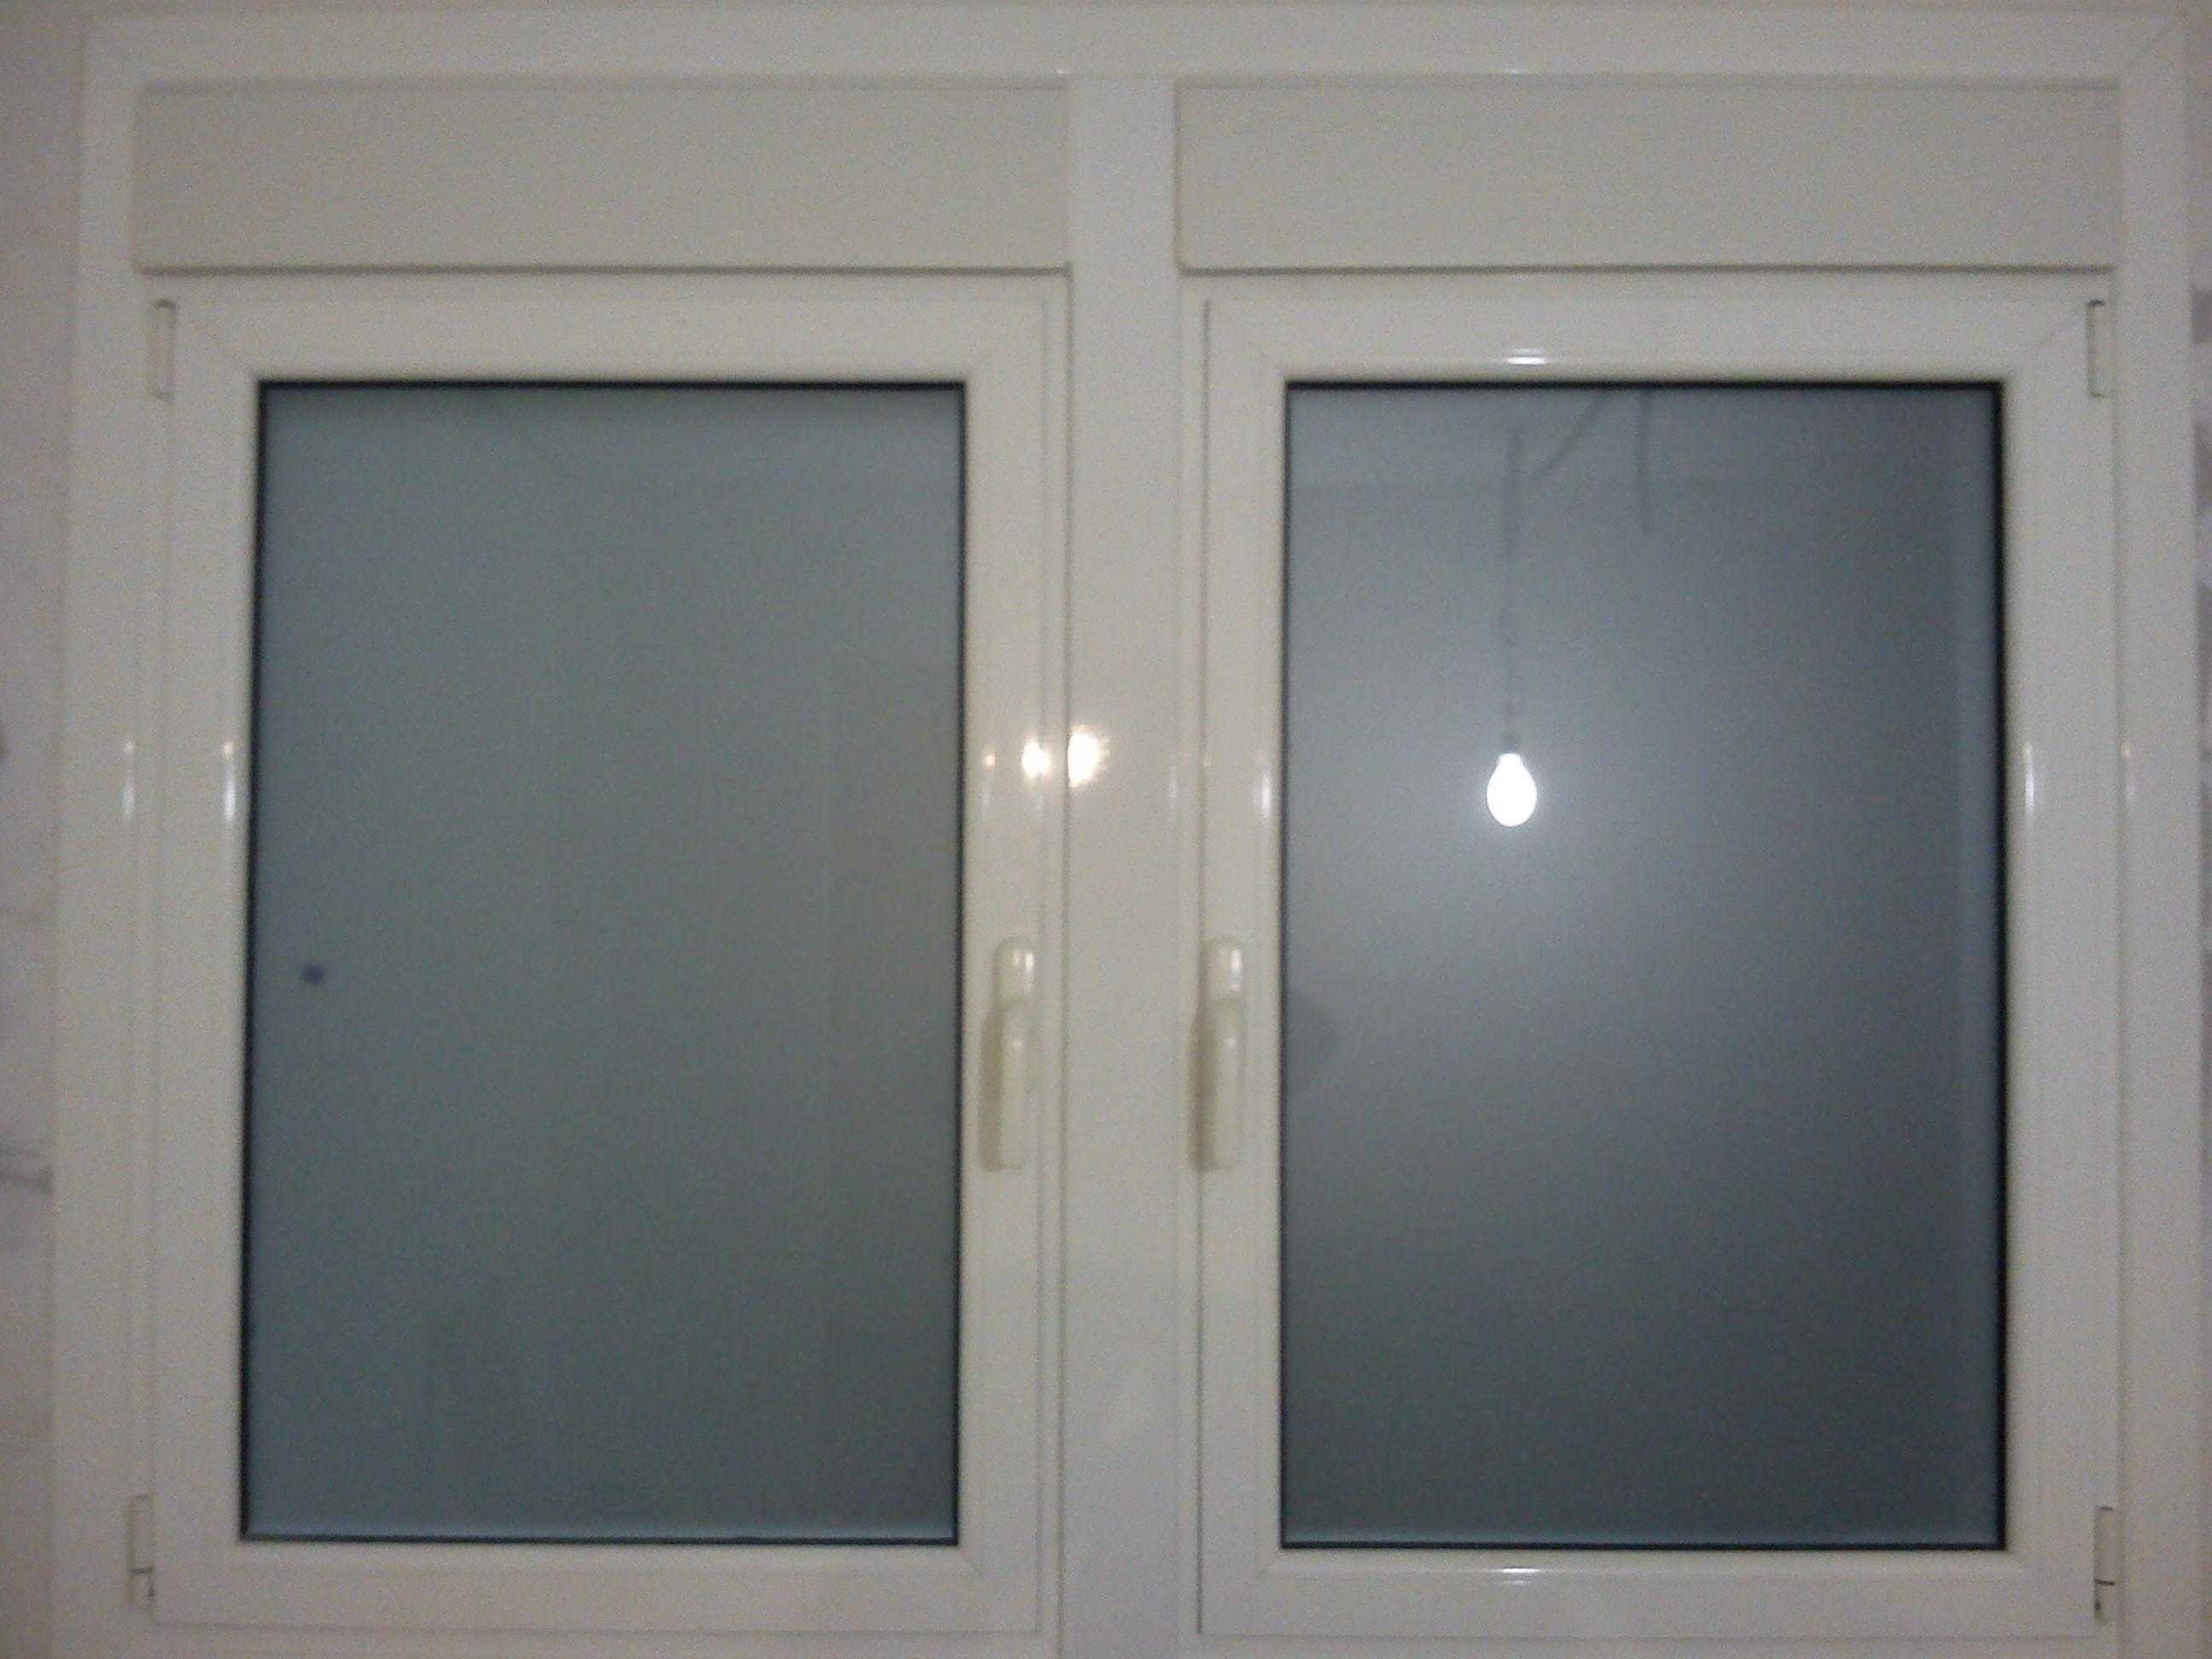 Ventanas de aluminio precio ventanas de aluminio precio - Precio cristal ventana ...